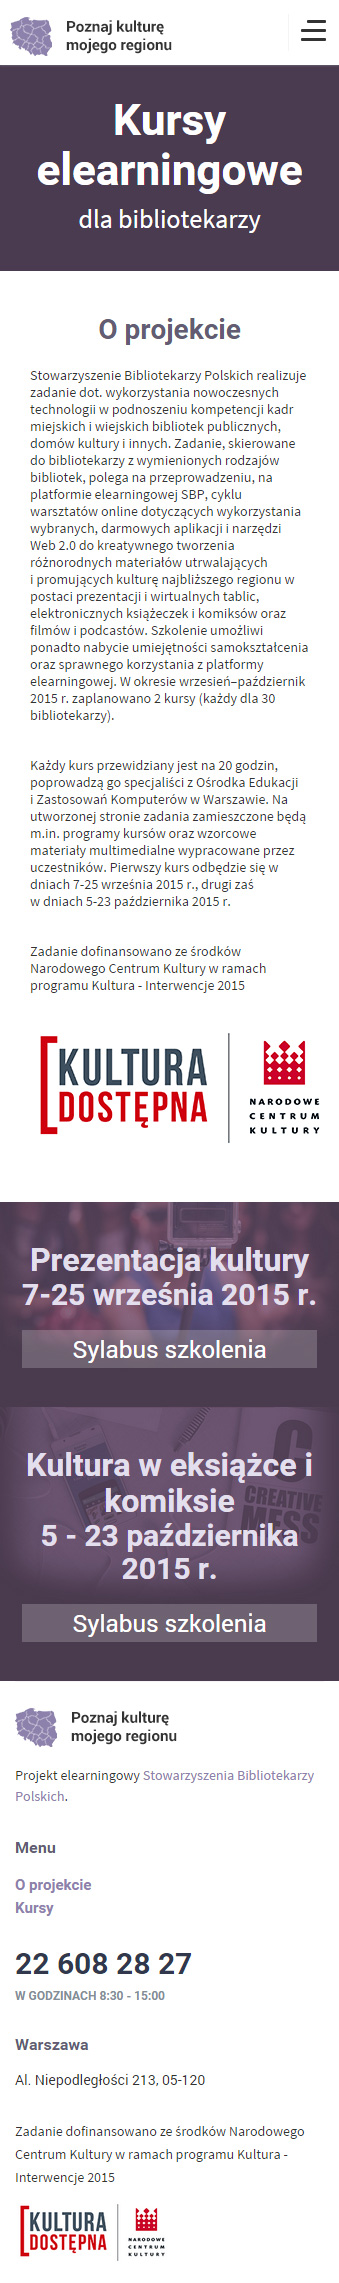 poznaj-kulture-2